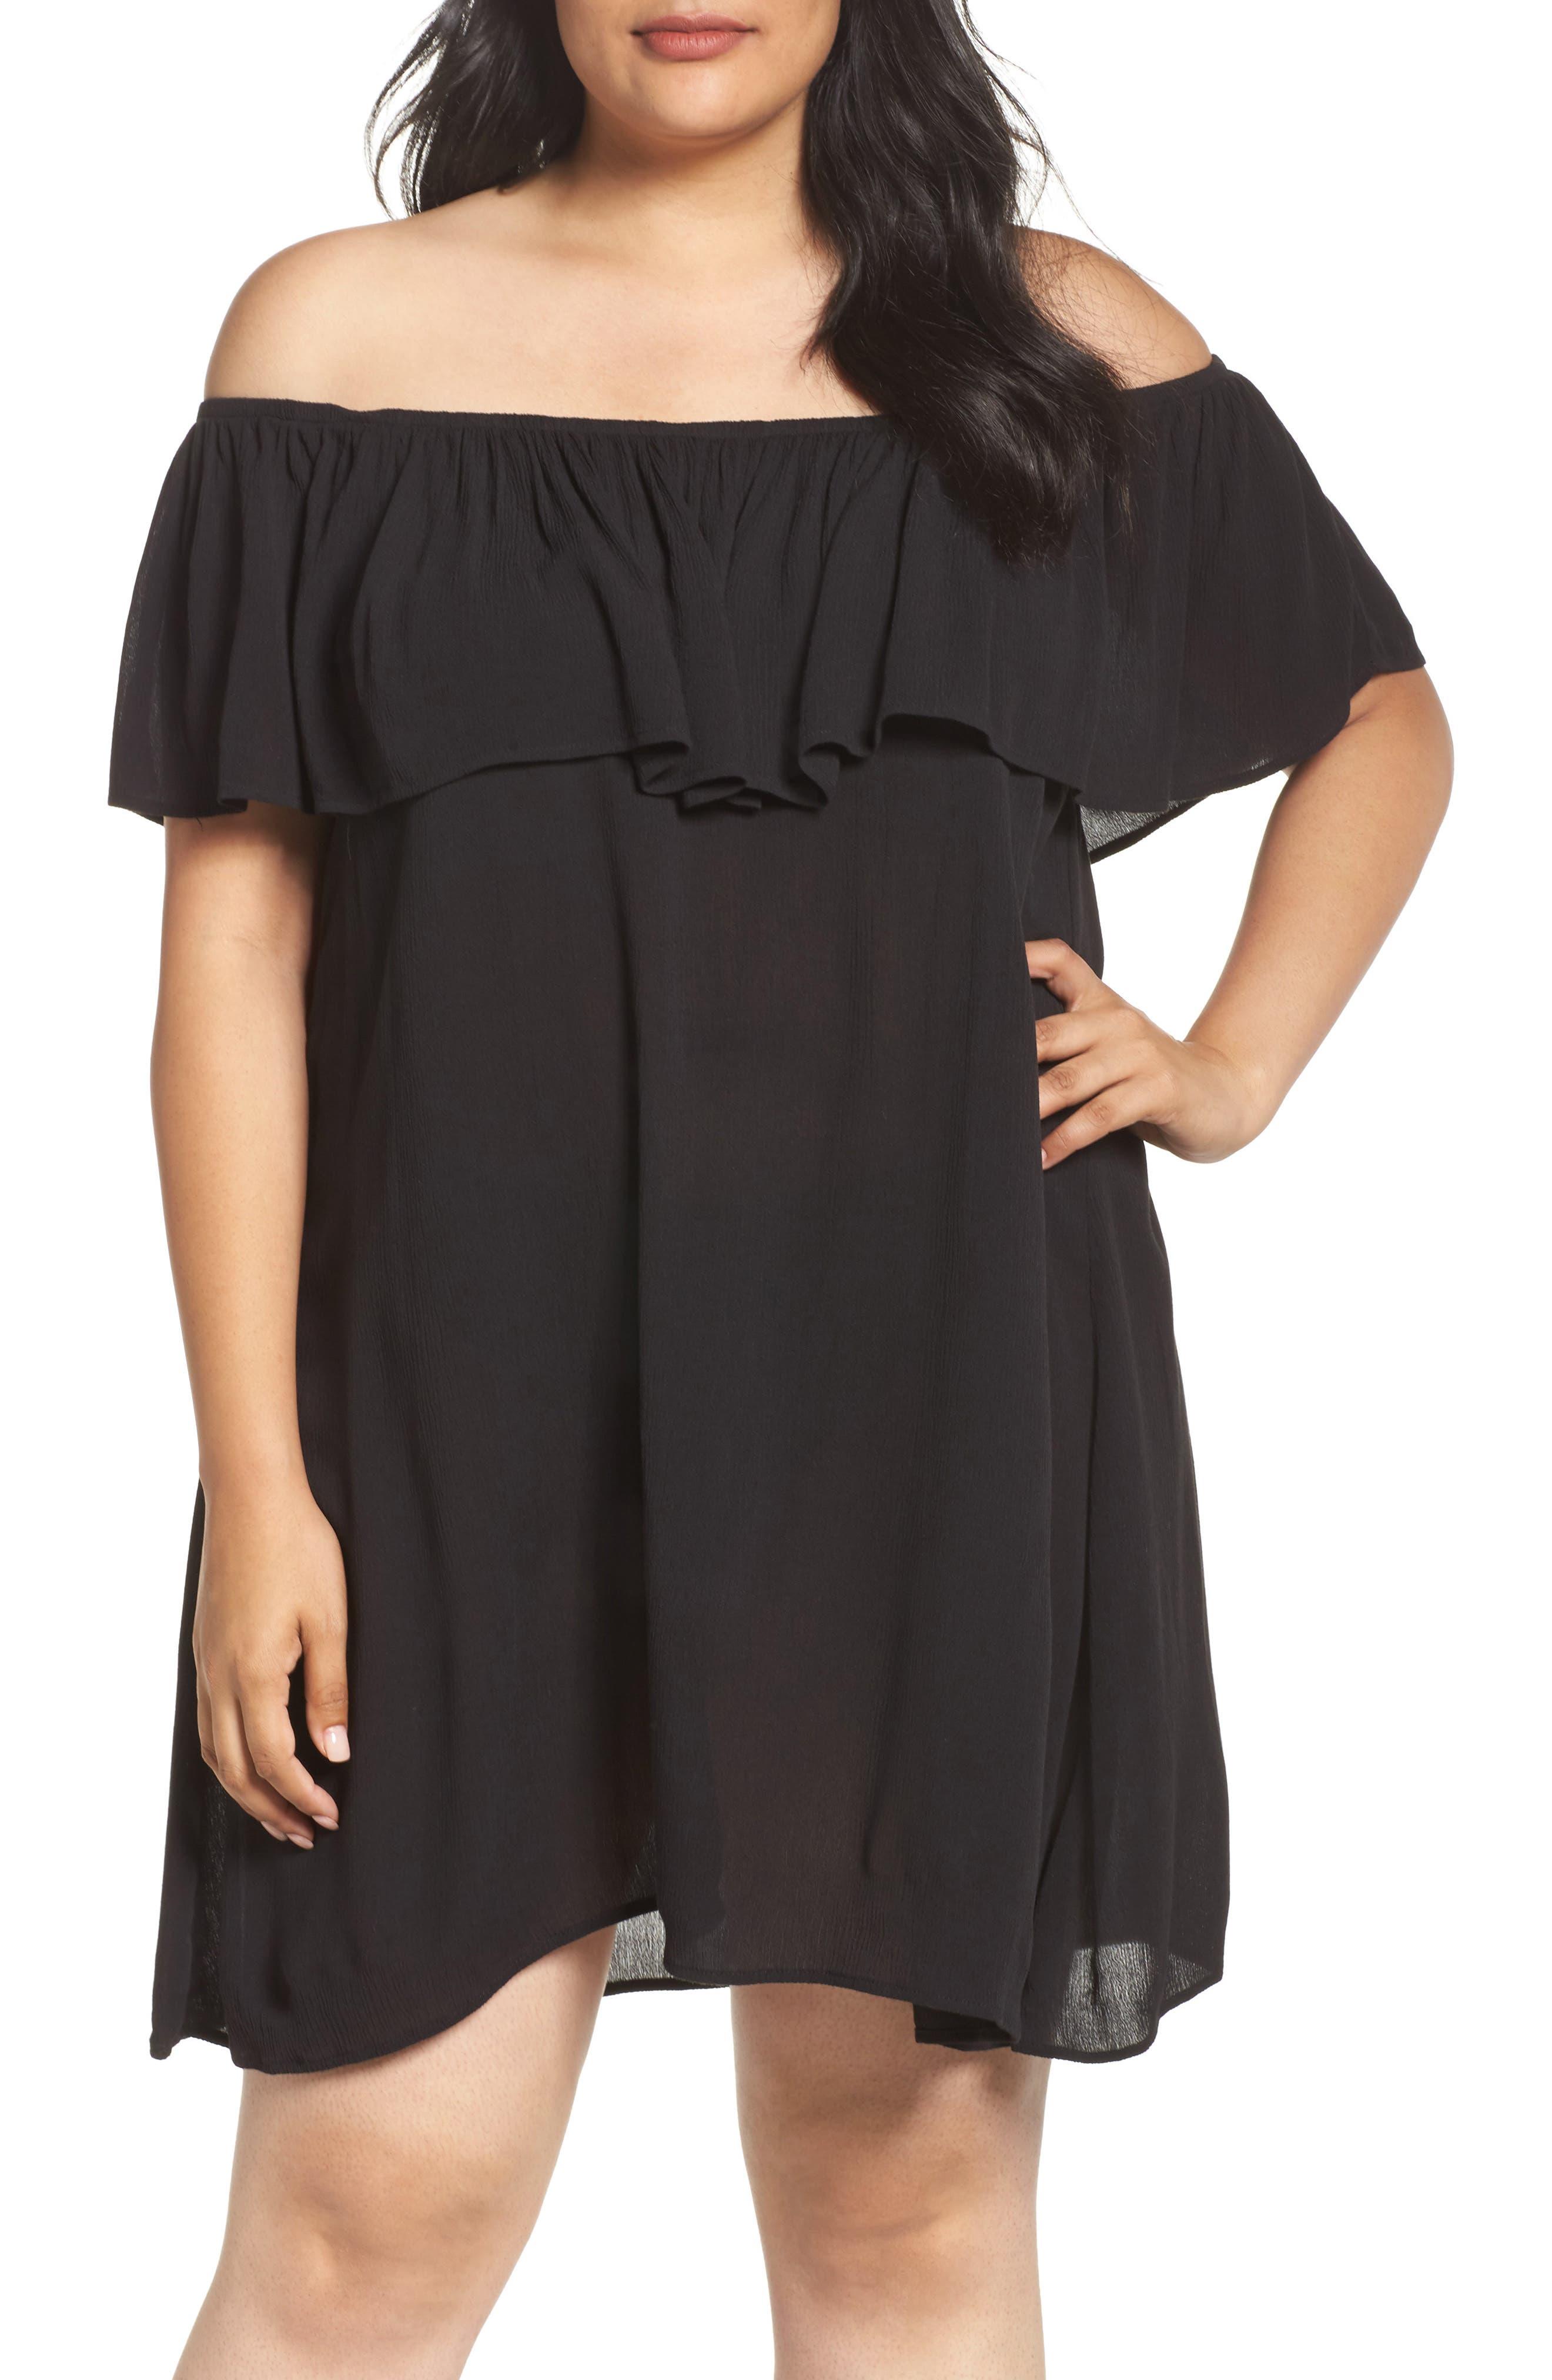 Southern Belle Off the Shoulder Cover-Up Dress,                         Main,                         color, 001